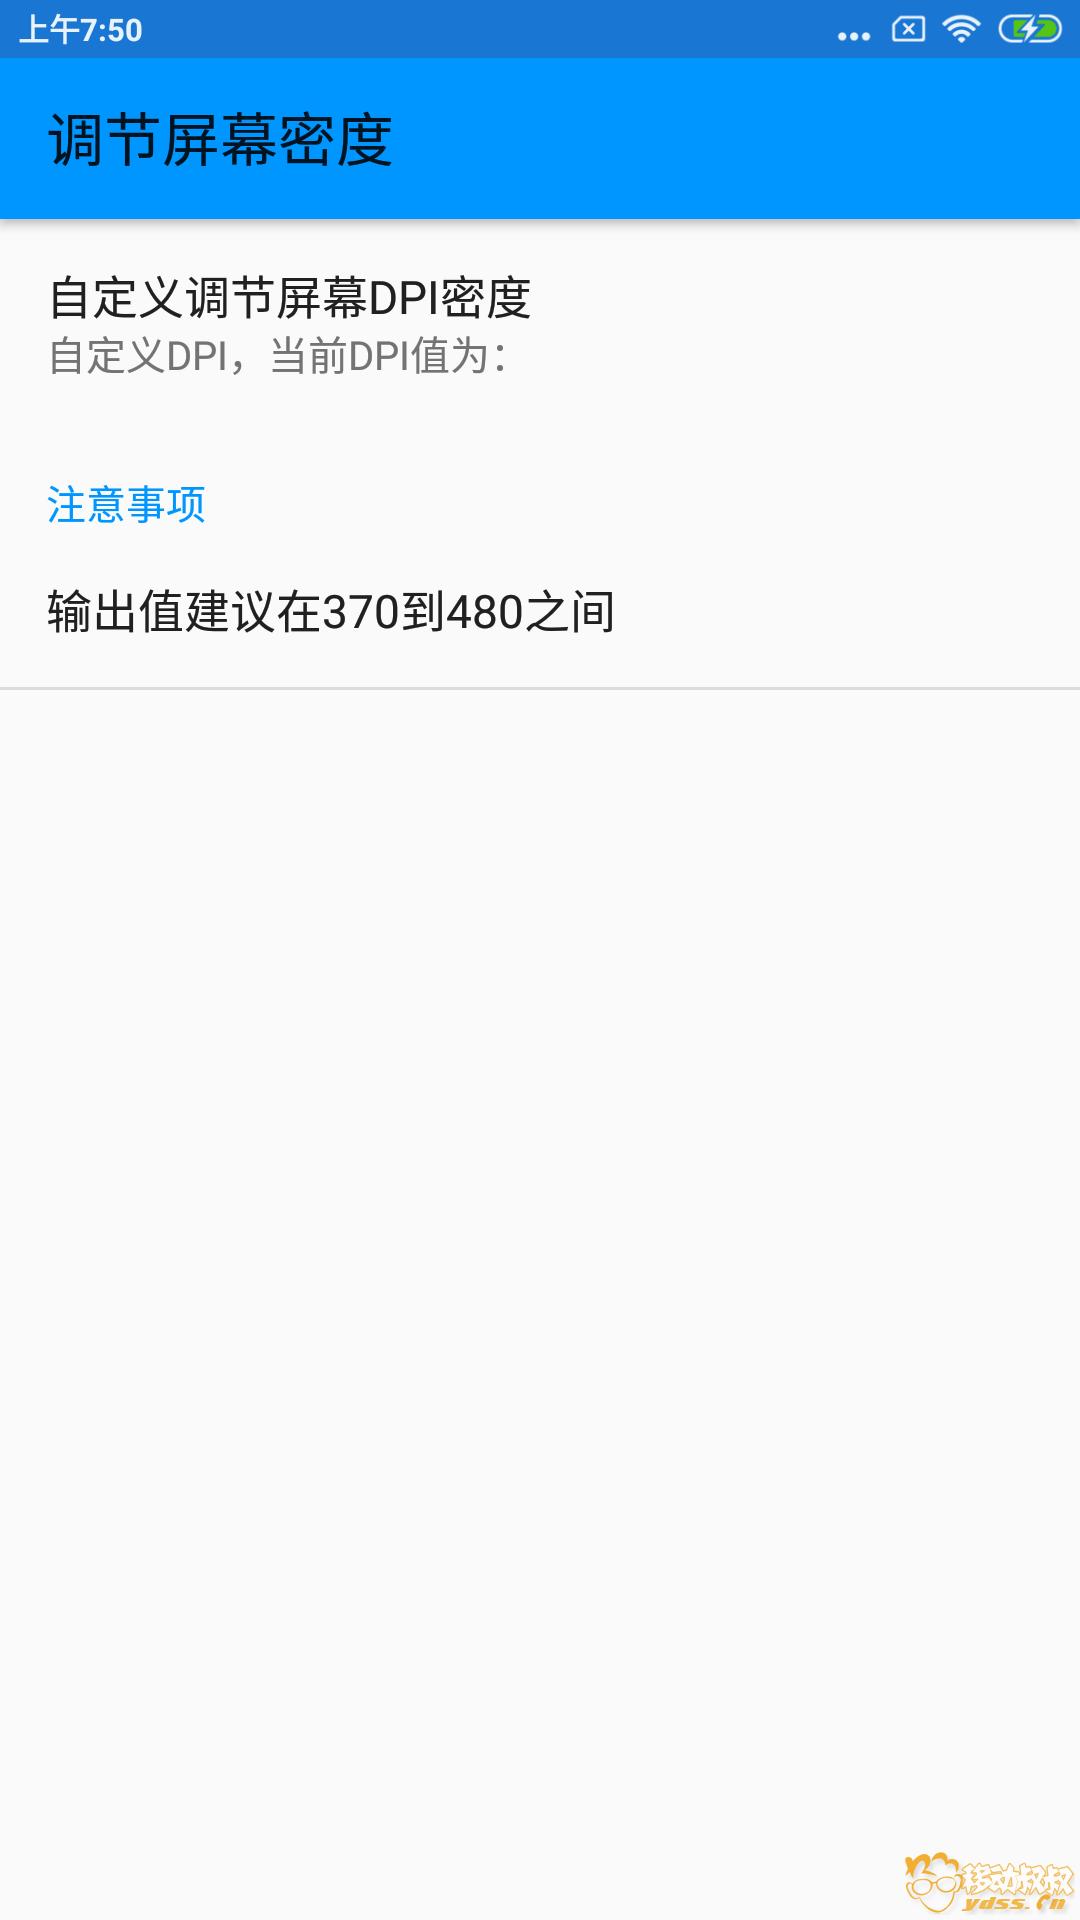 Screenshot_2018-07-11-07-50-17-124_com.zhanhong.tools.png